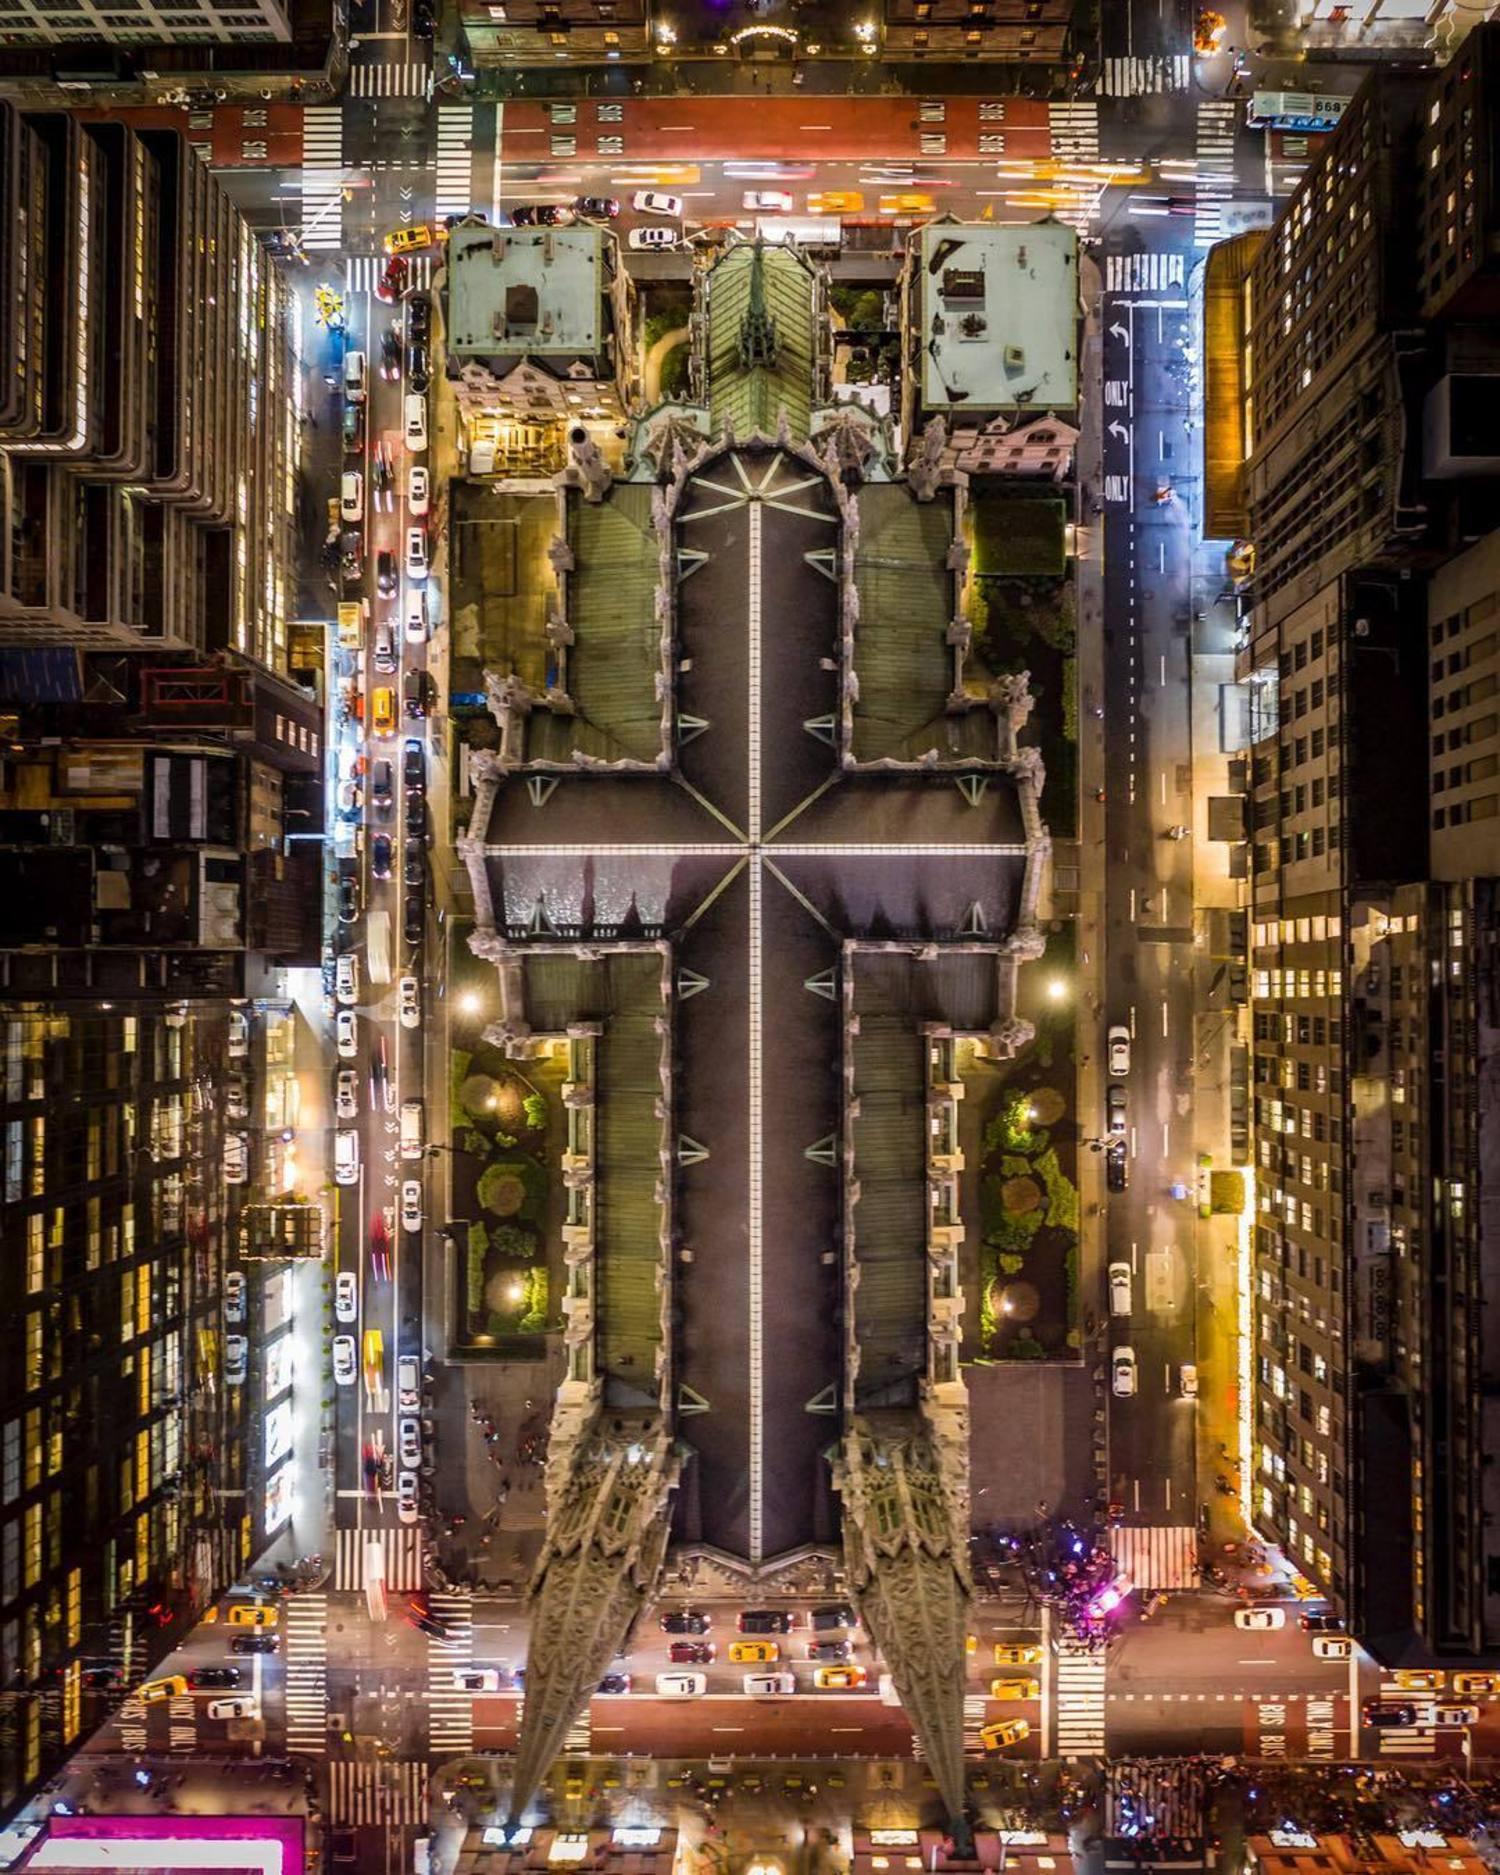 St. Patrick's Cathedral, Midtown, Manhattan